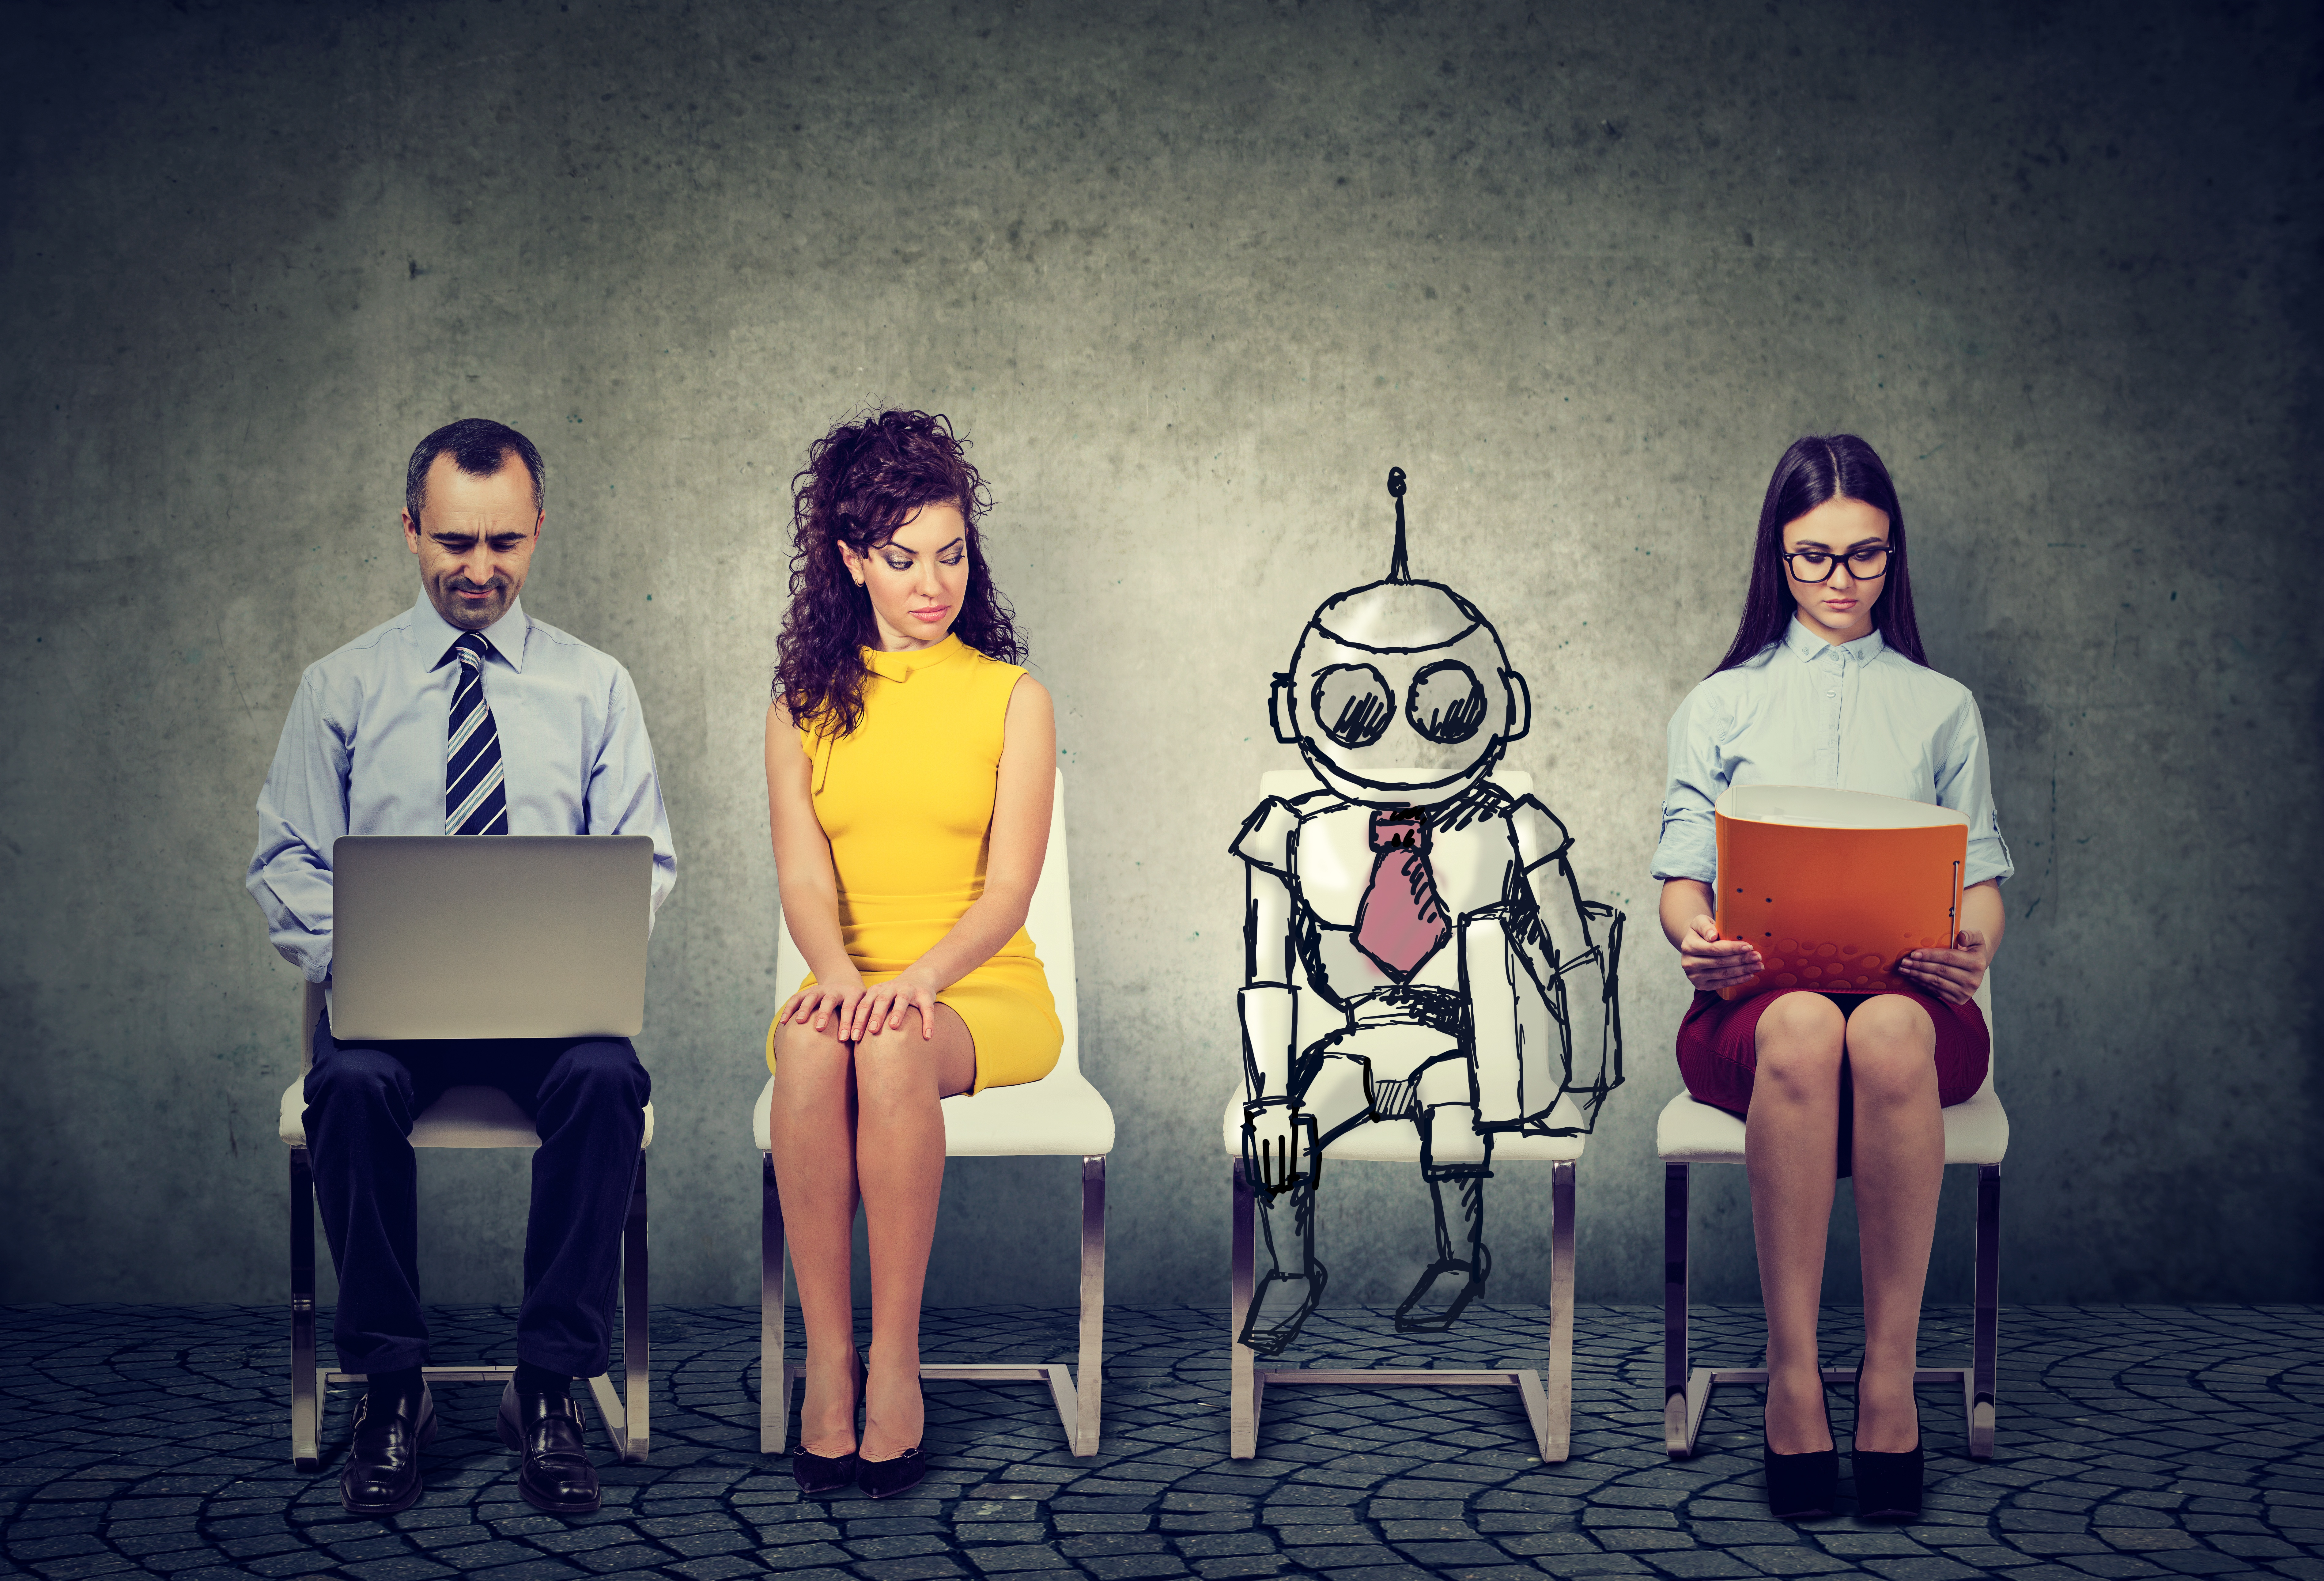 iStock-852049214 robot and people sitting.jpg